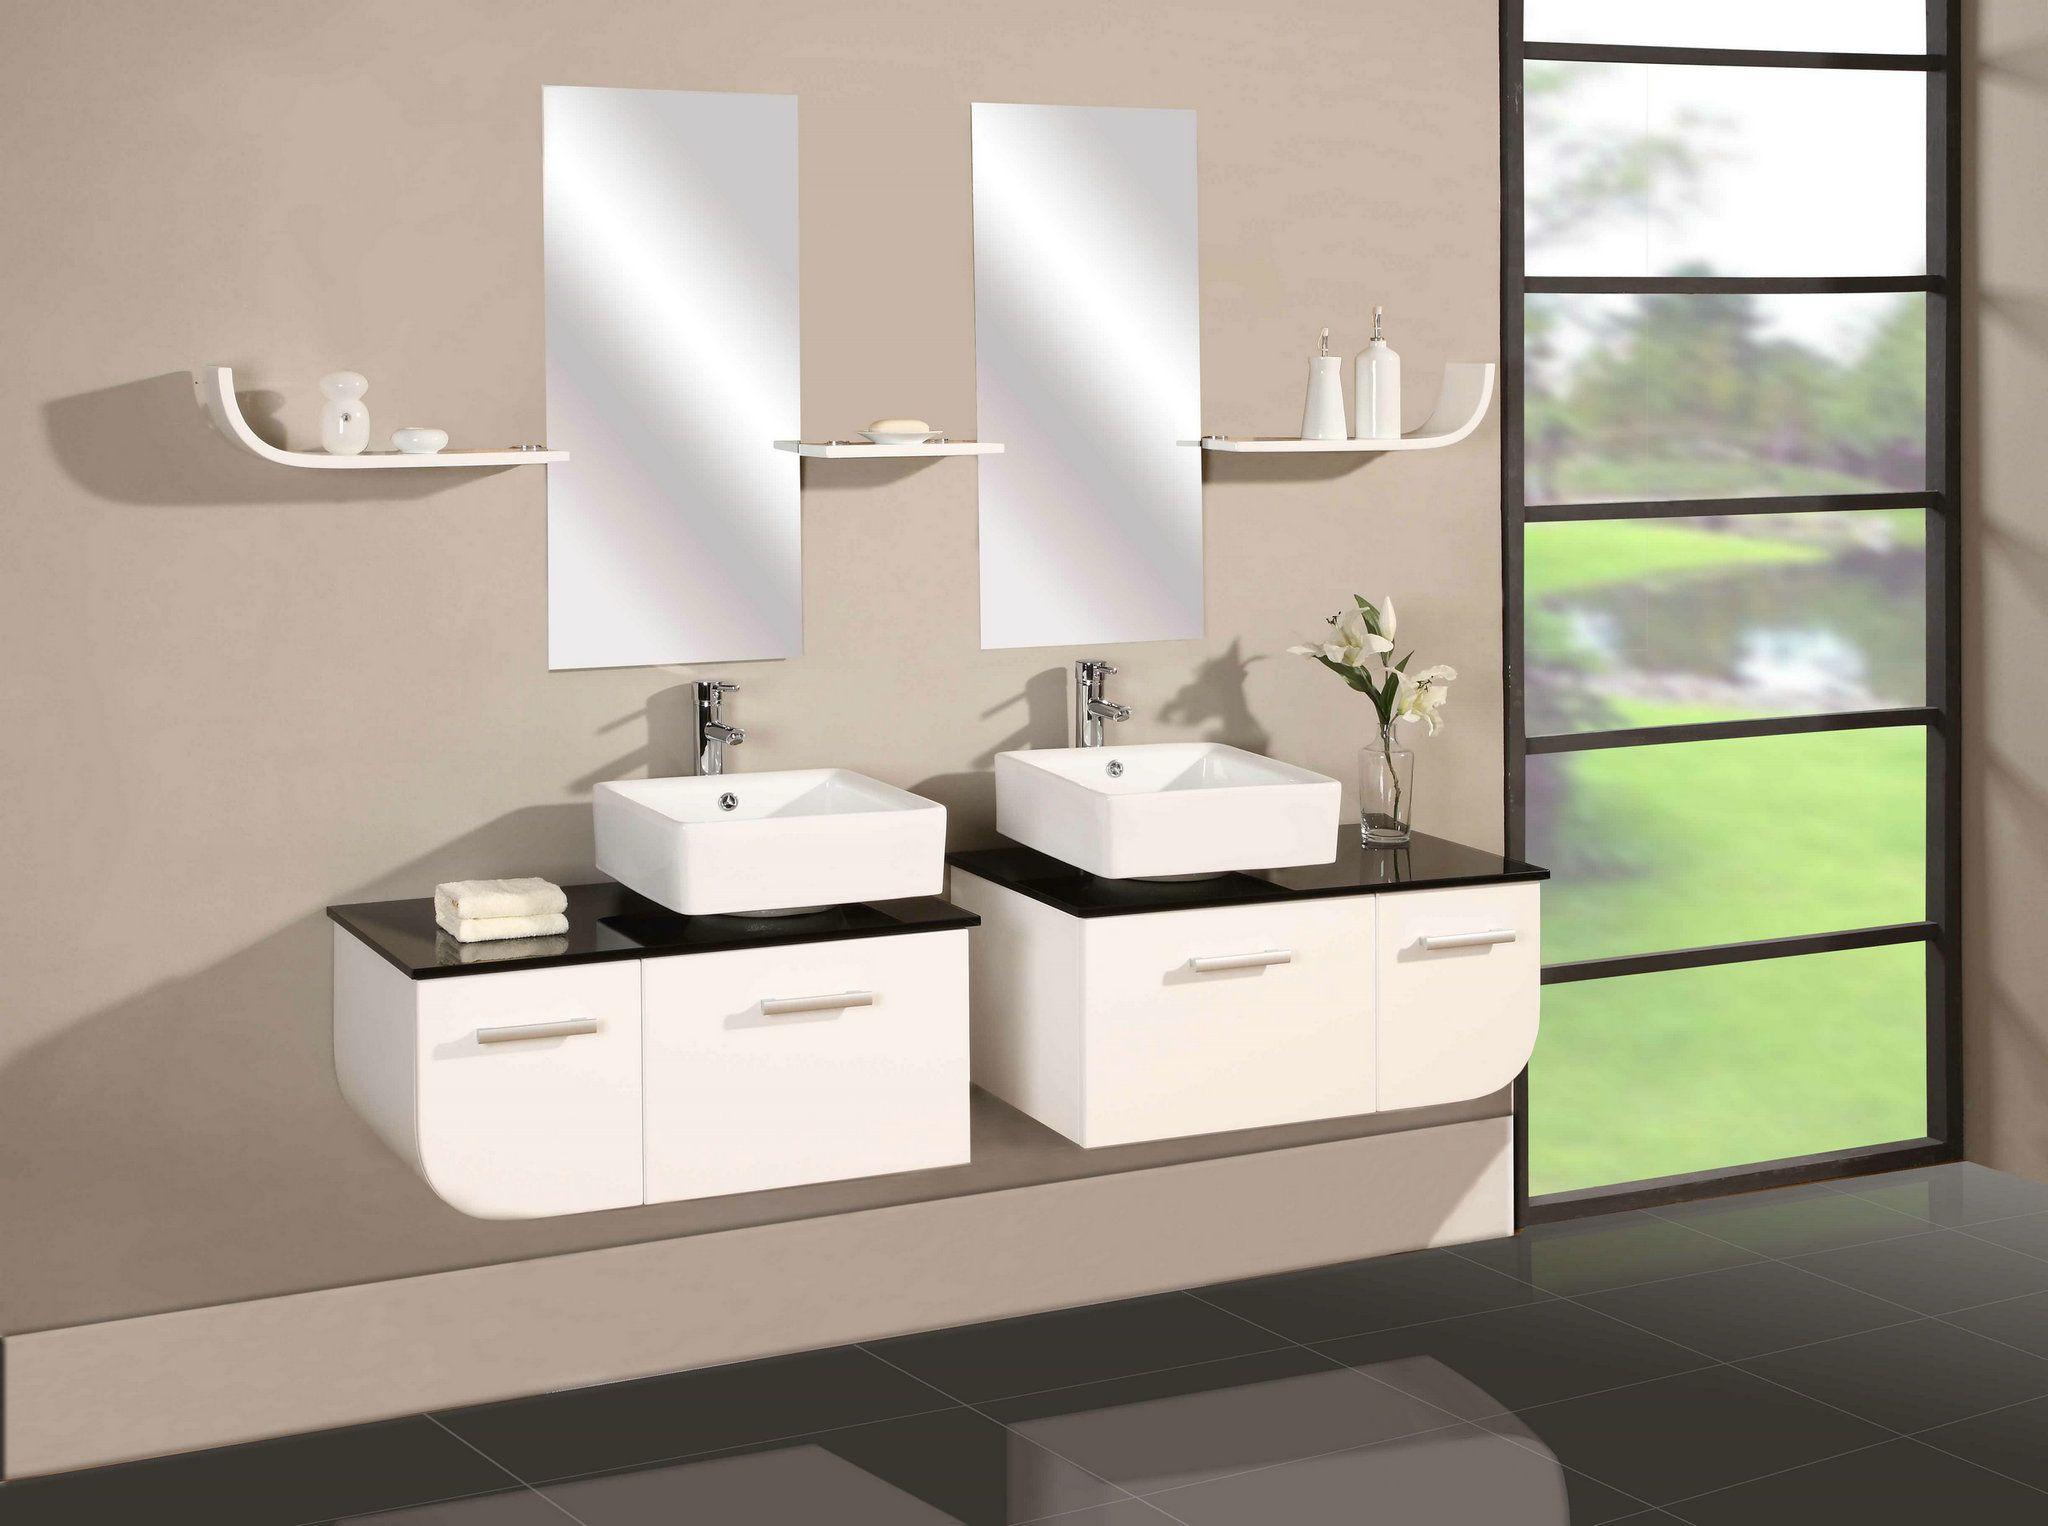 Design A Bathroom Vanity Online Beauteous Modern Design Bathroom Vanities Beautiful  Bathrooms  Pinterest Design Inspiration